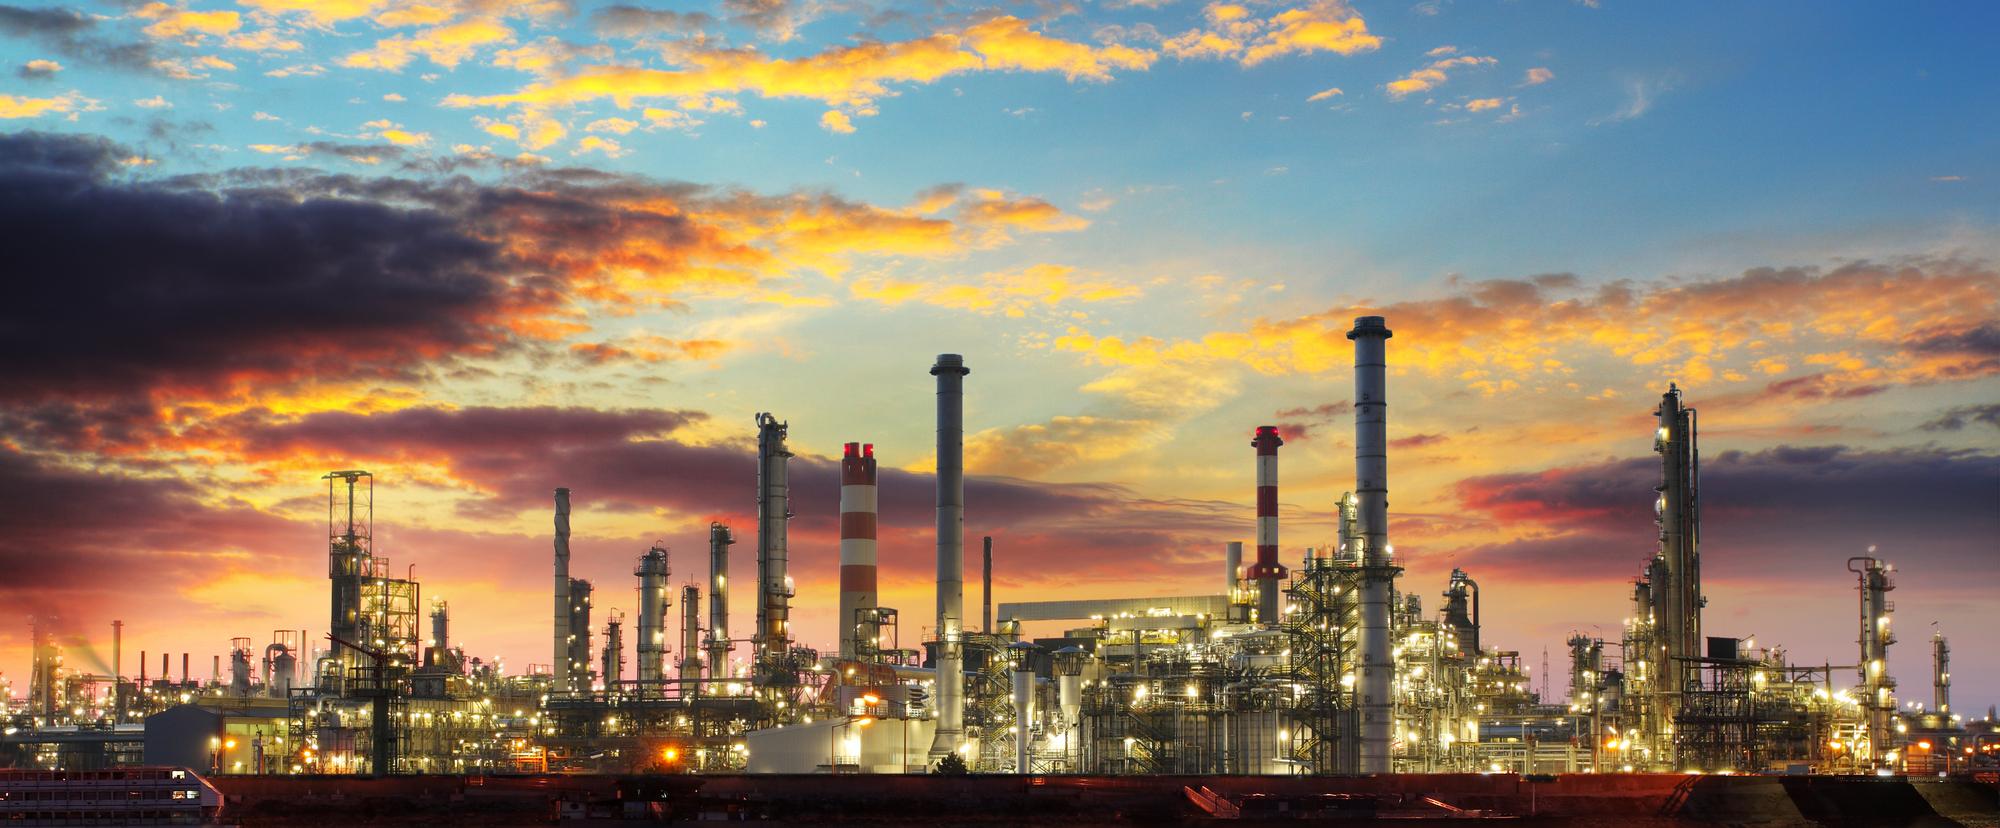 Case Study: Heavy Industry (Refining)